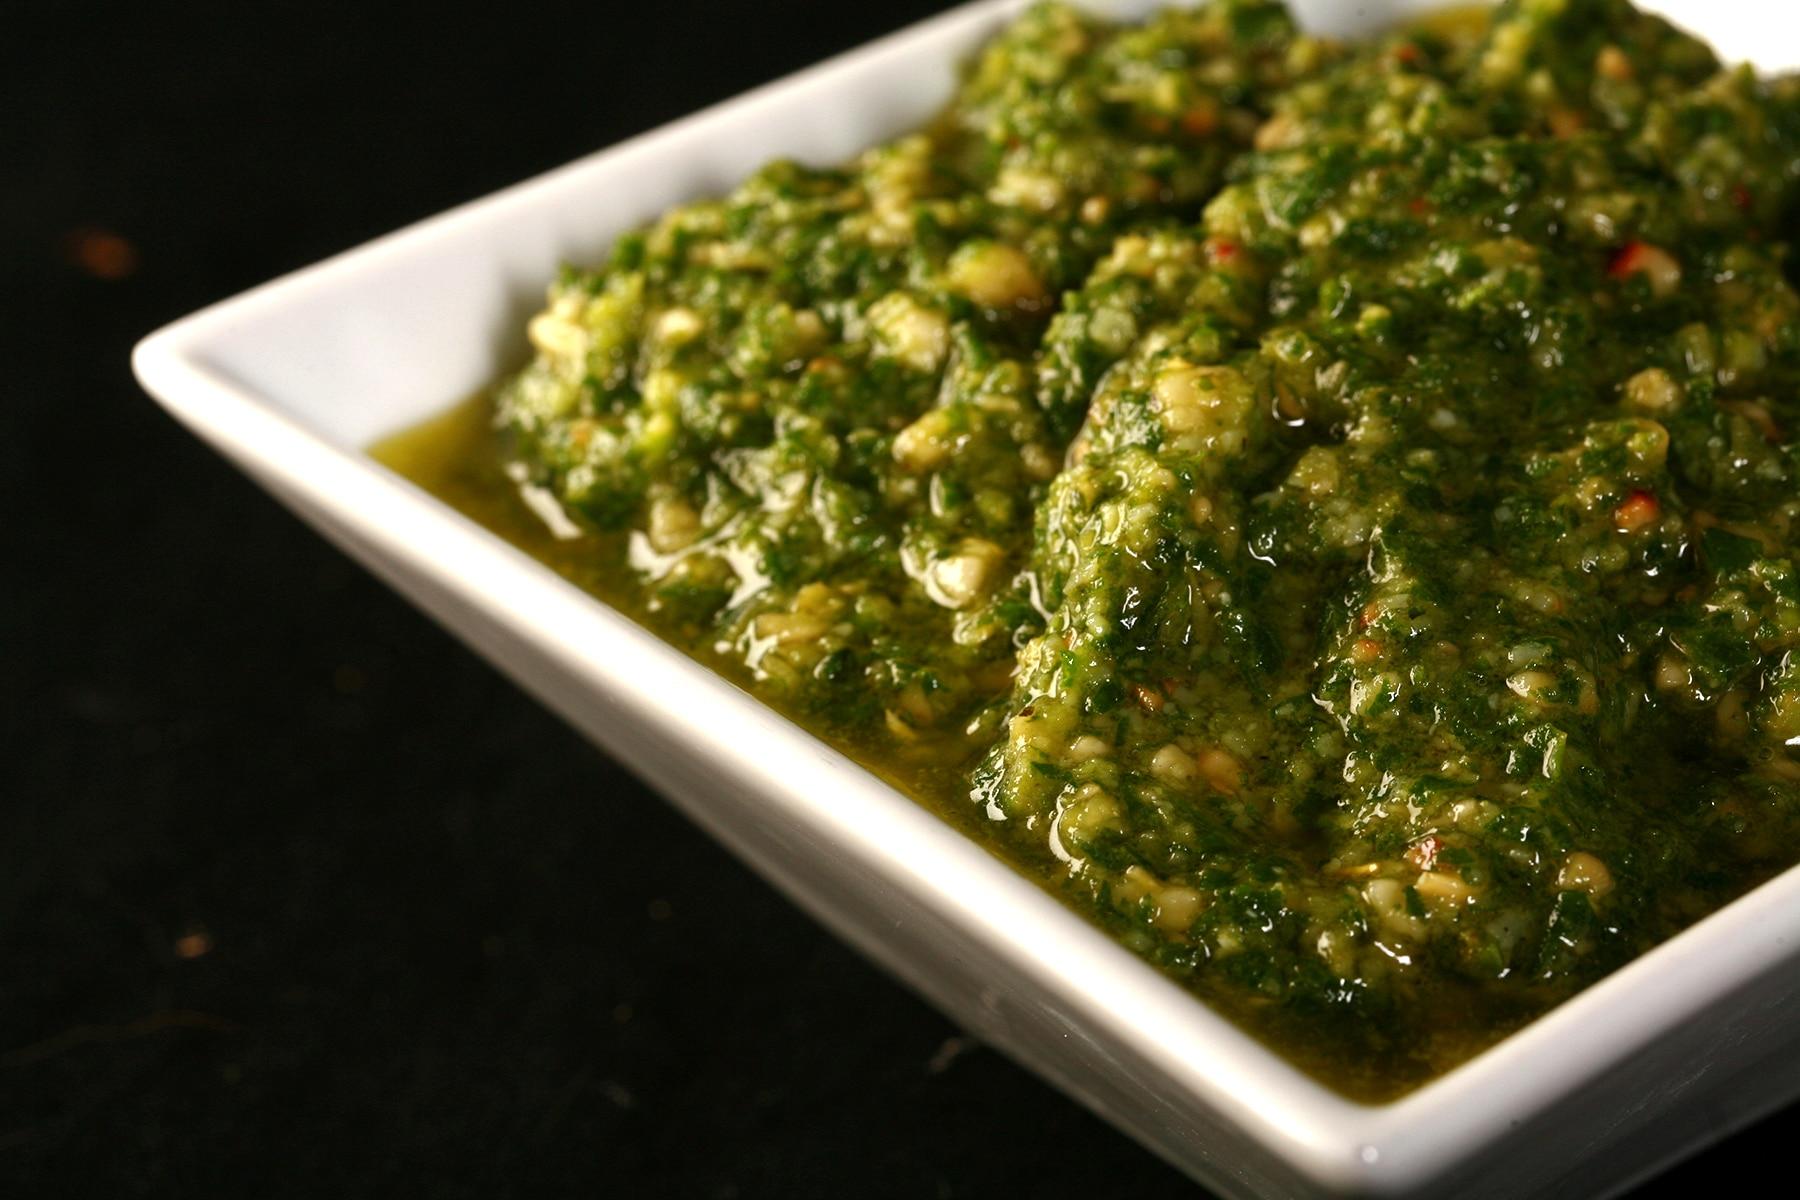 A small white bowl full of homemade basil pesto.